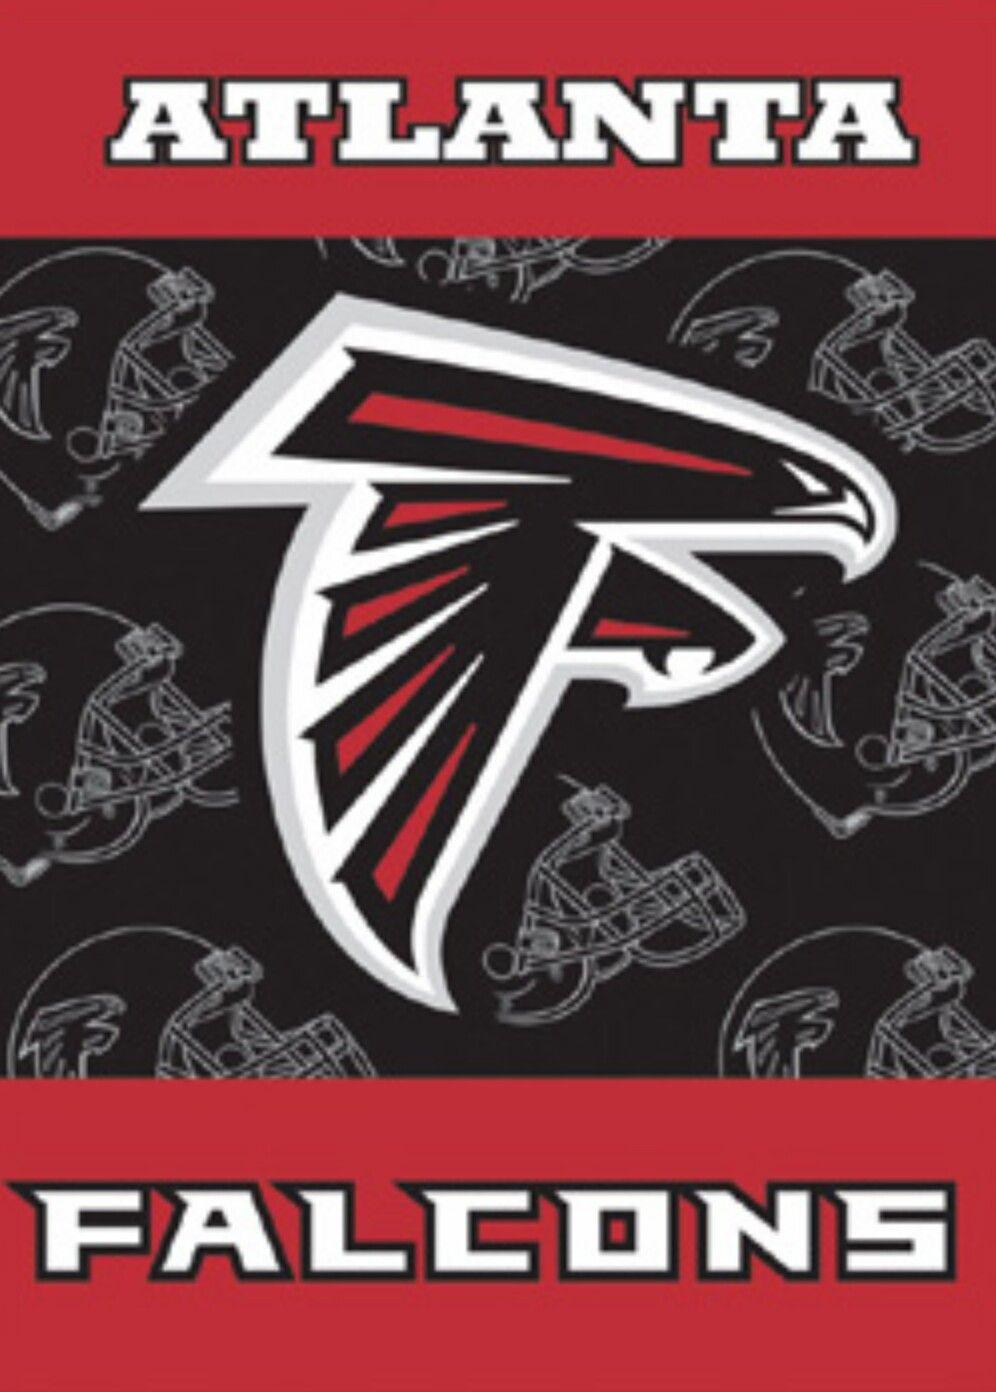 Pin By Miyoshi Brewster Bolton On Atlanta Falcons Baby Atlanta Falcons Banner Atlanta Falcons Atlanta Falcons Flag